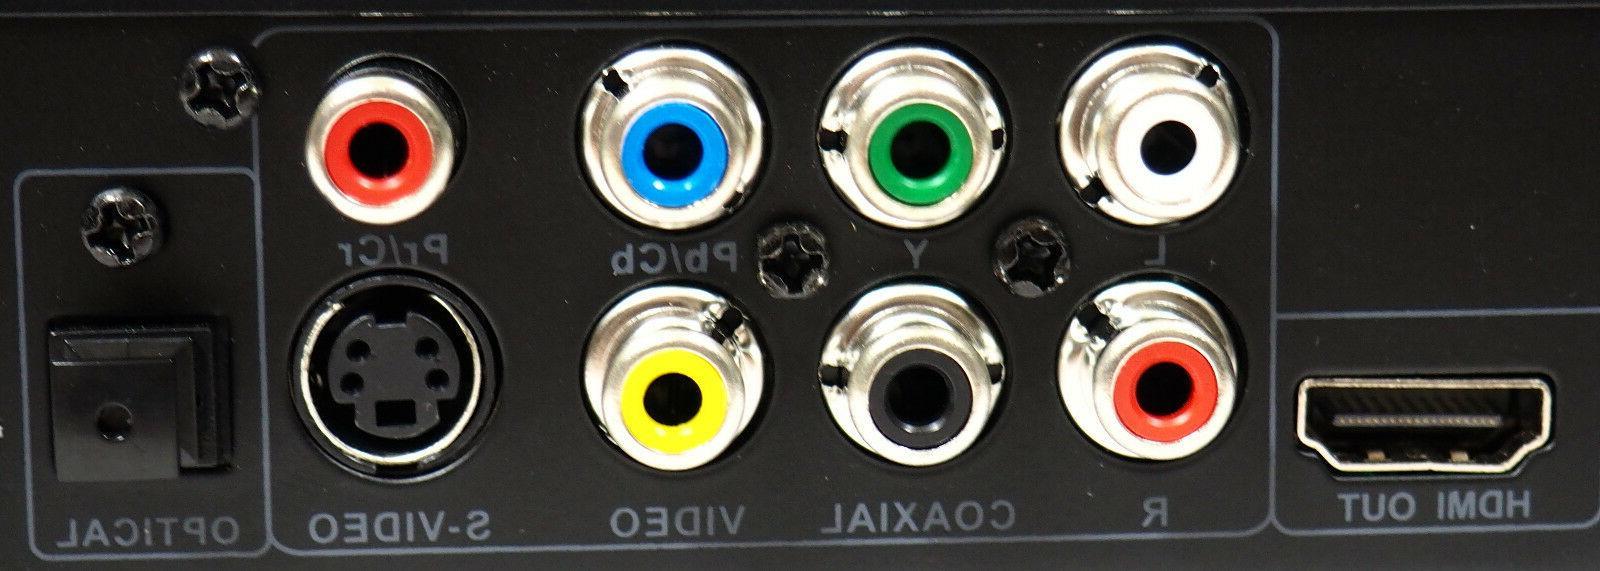 JVC Region Code HDMI Player PAL